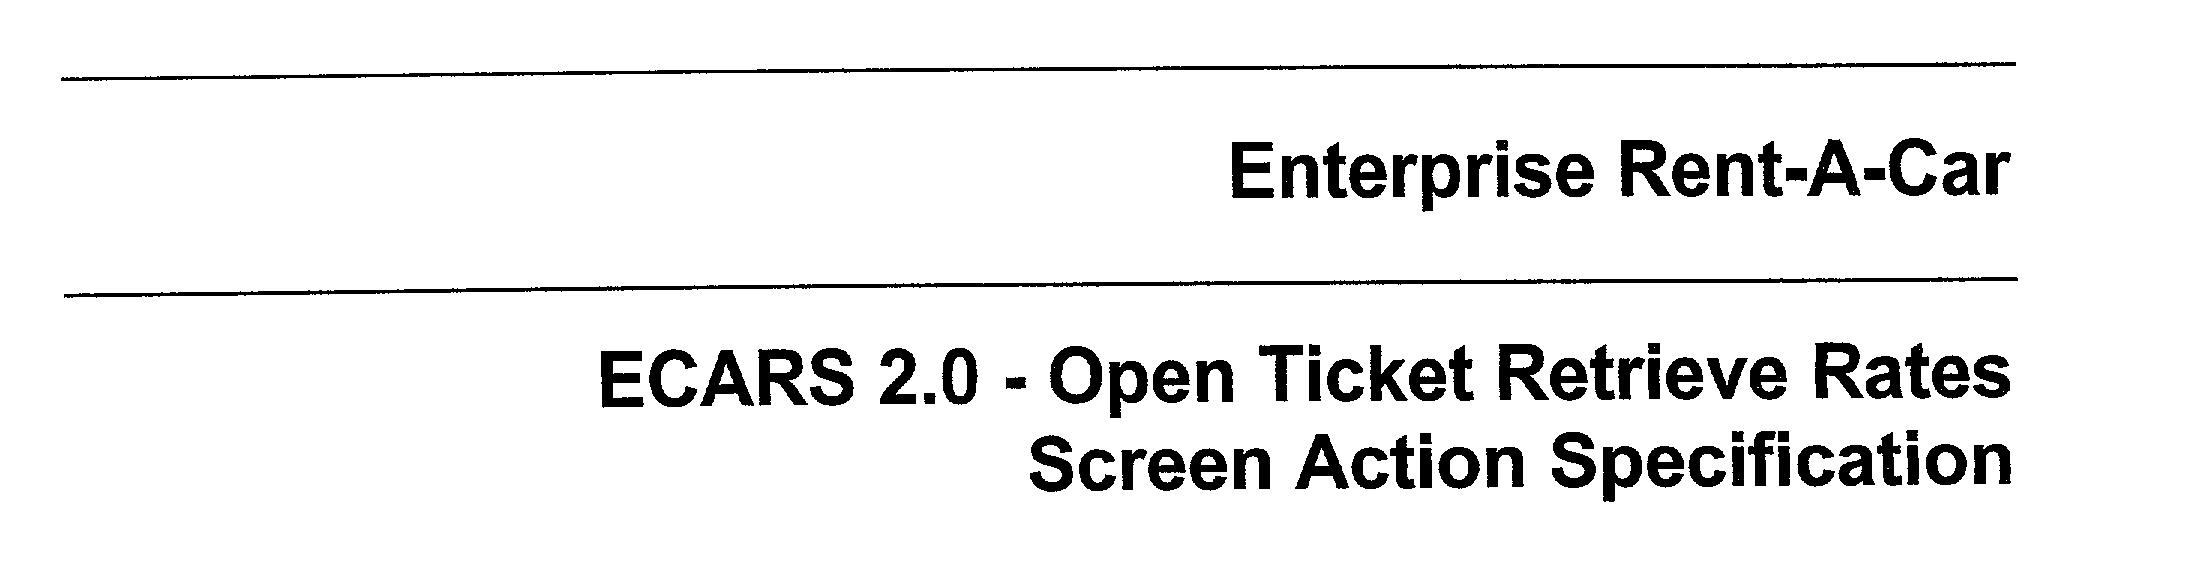 Figure US20030125992A1-20030703-P01964